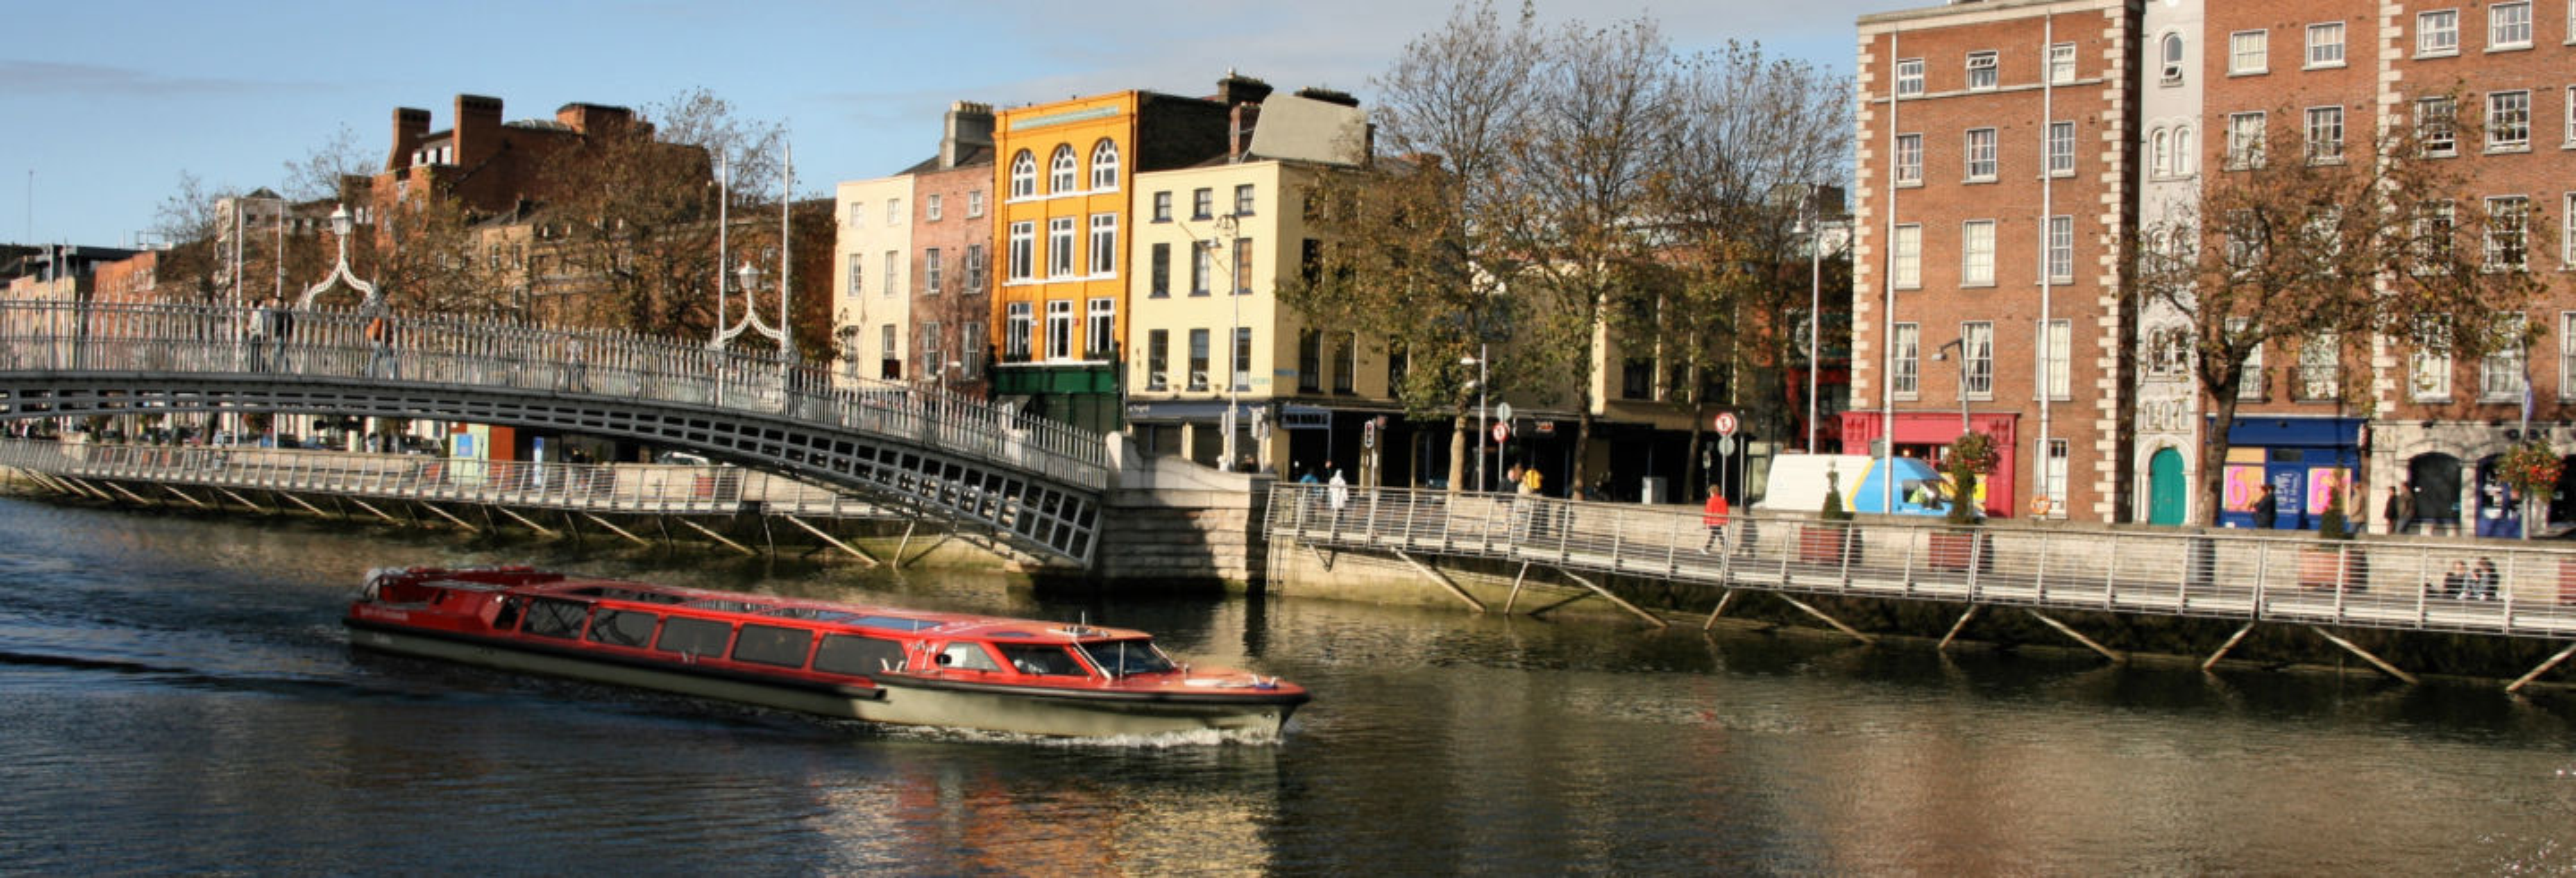 Dublin Boat Trip